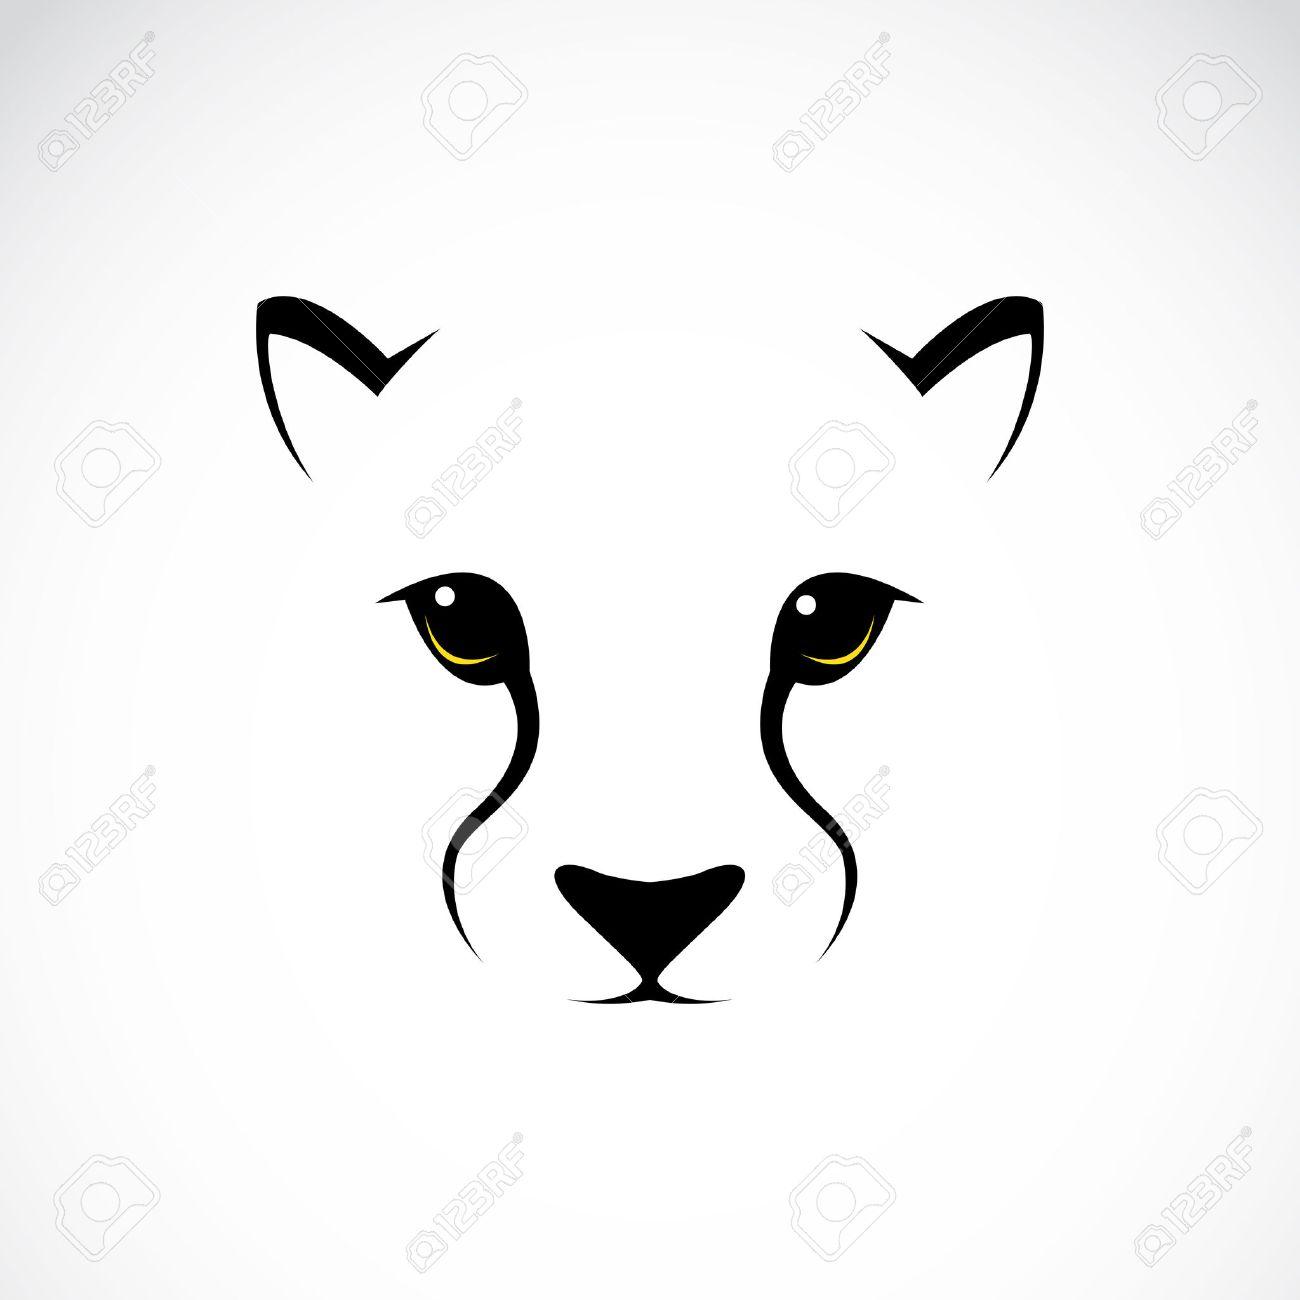 4 203 jaguar stock illustrations cliparts and royalty free jaguar